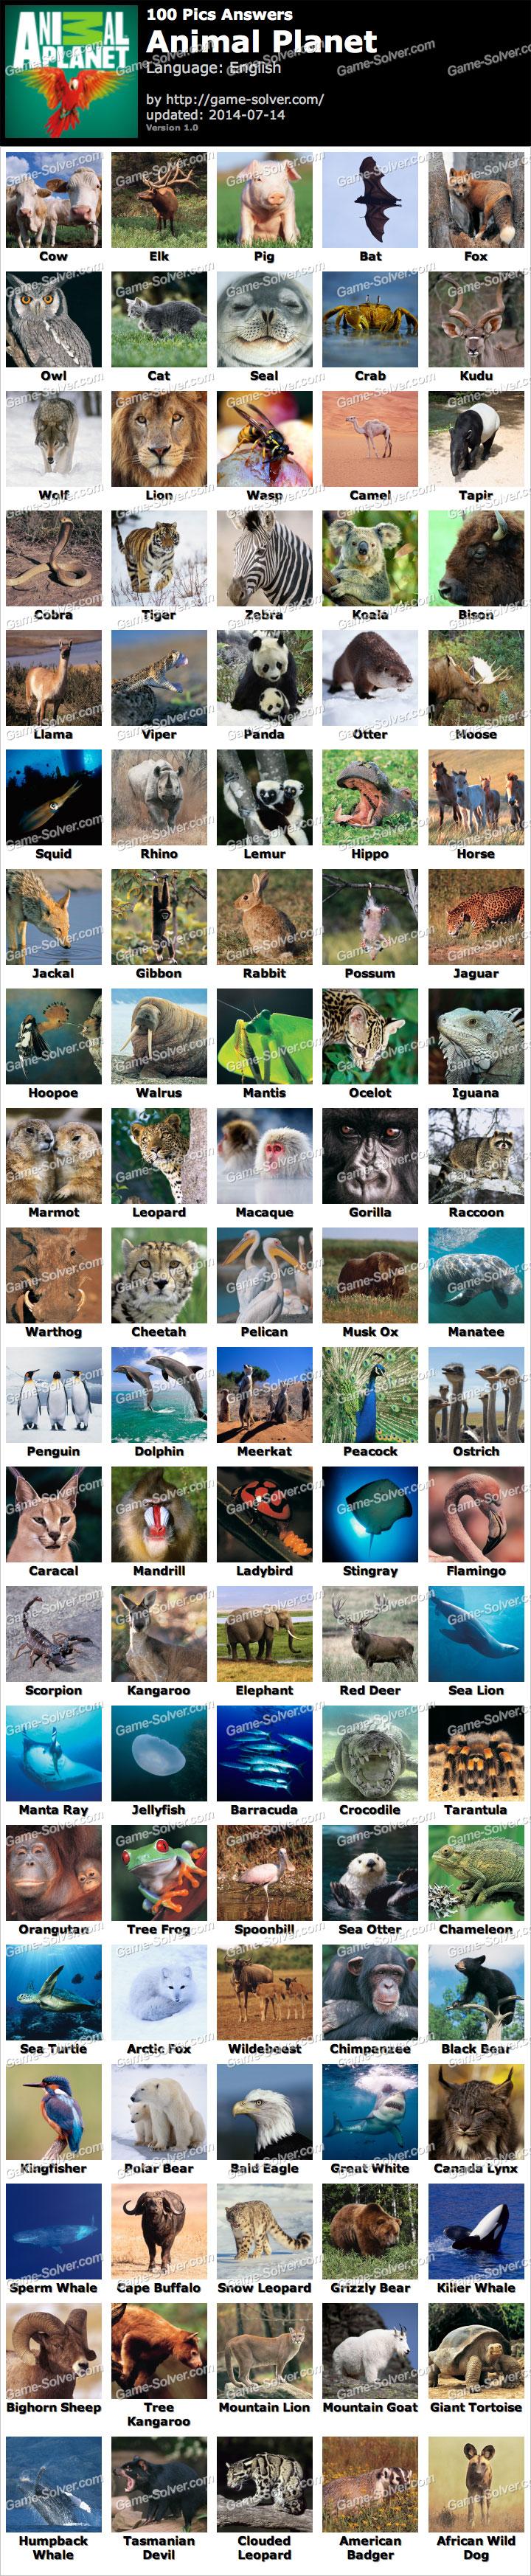 100 pics animal planet game solver